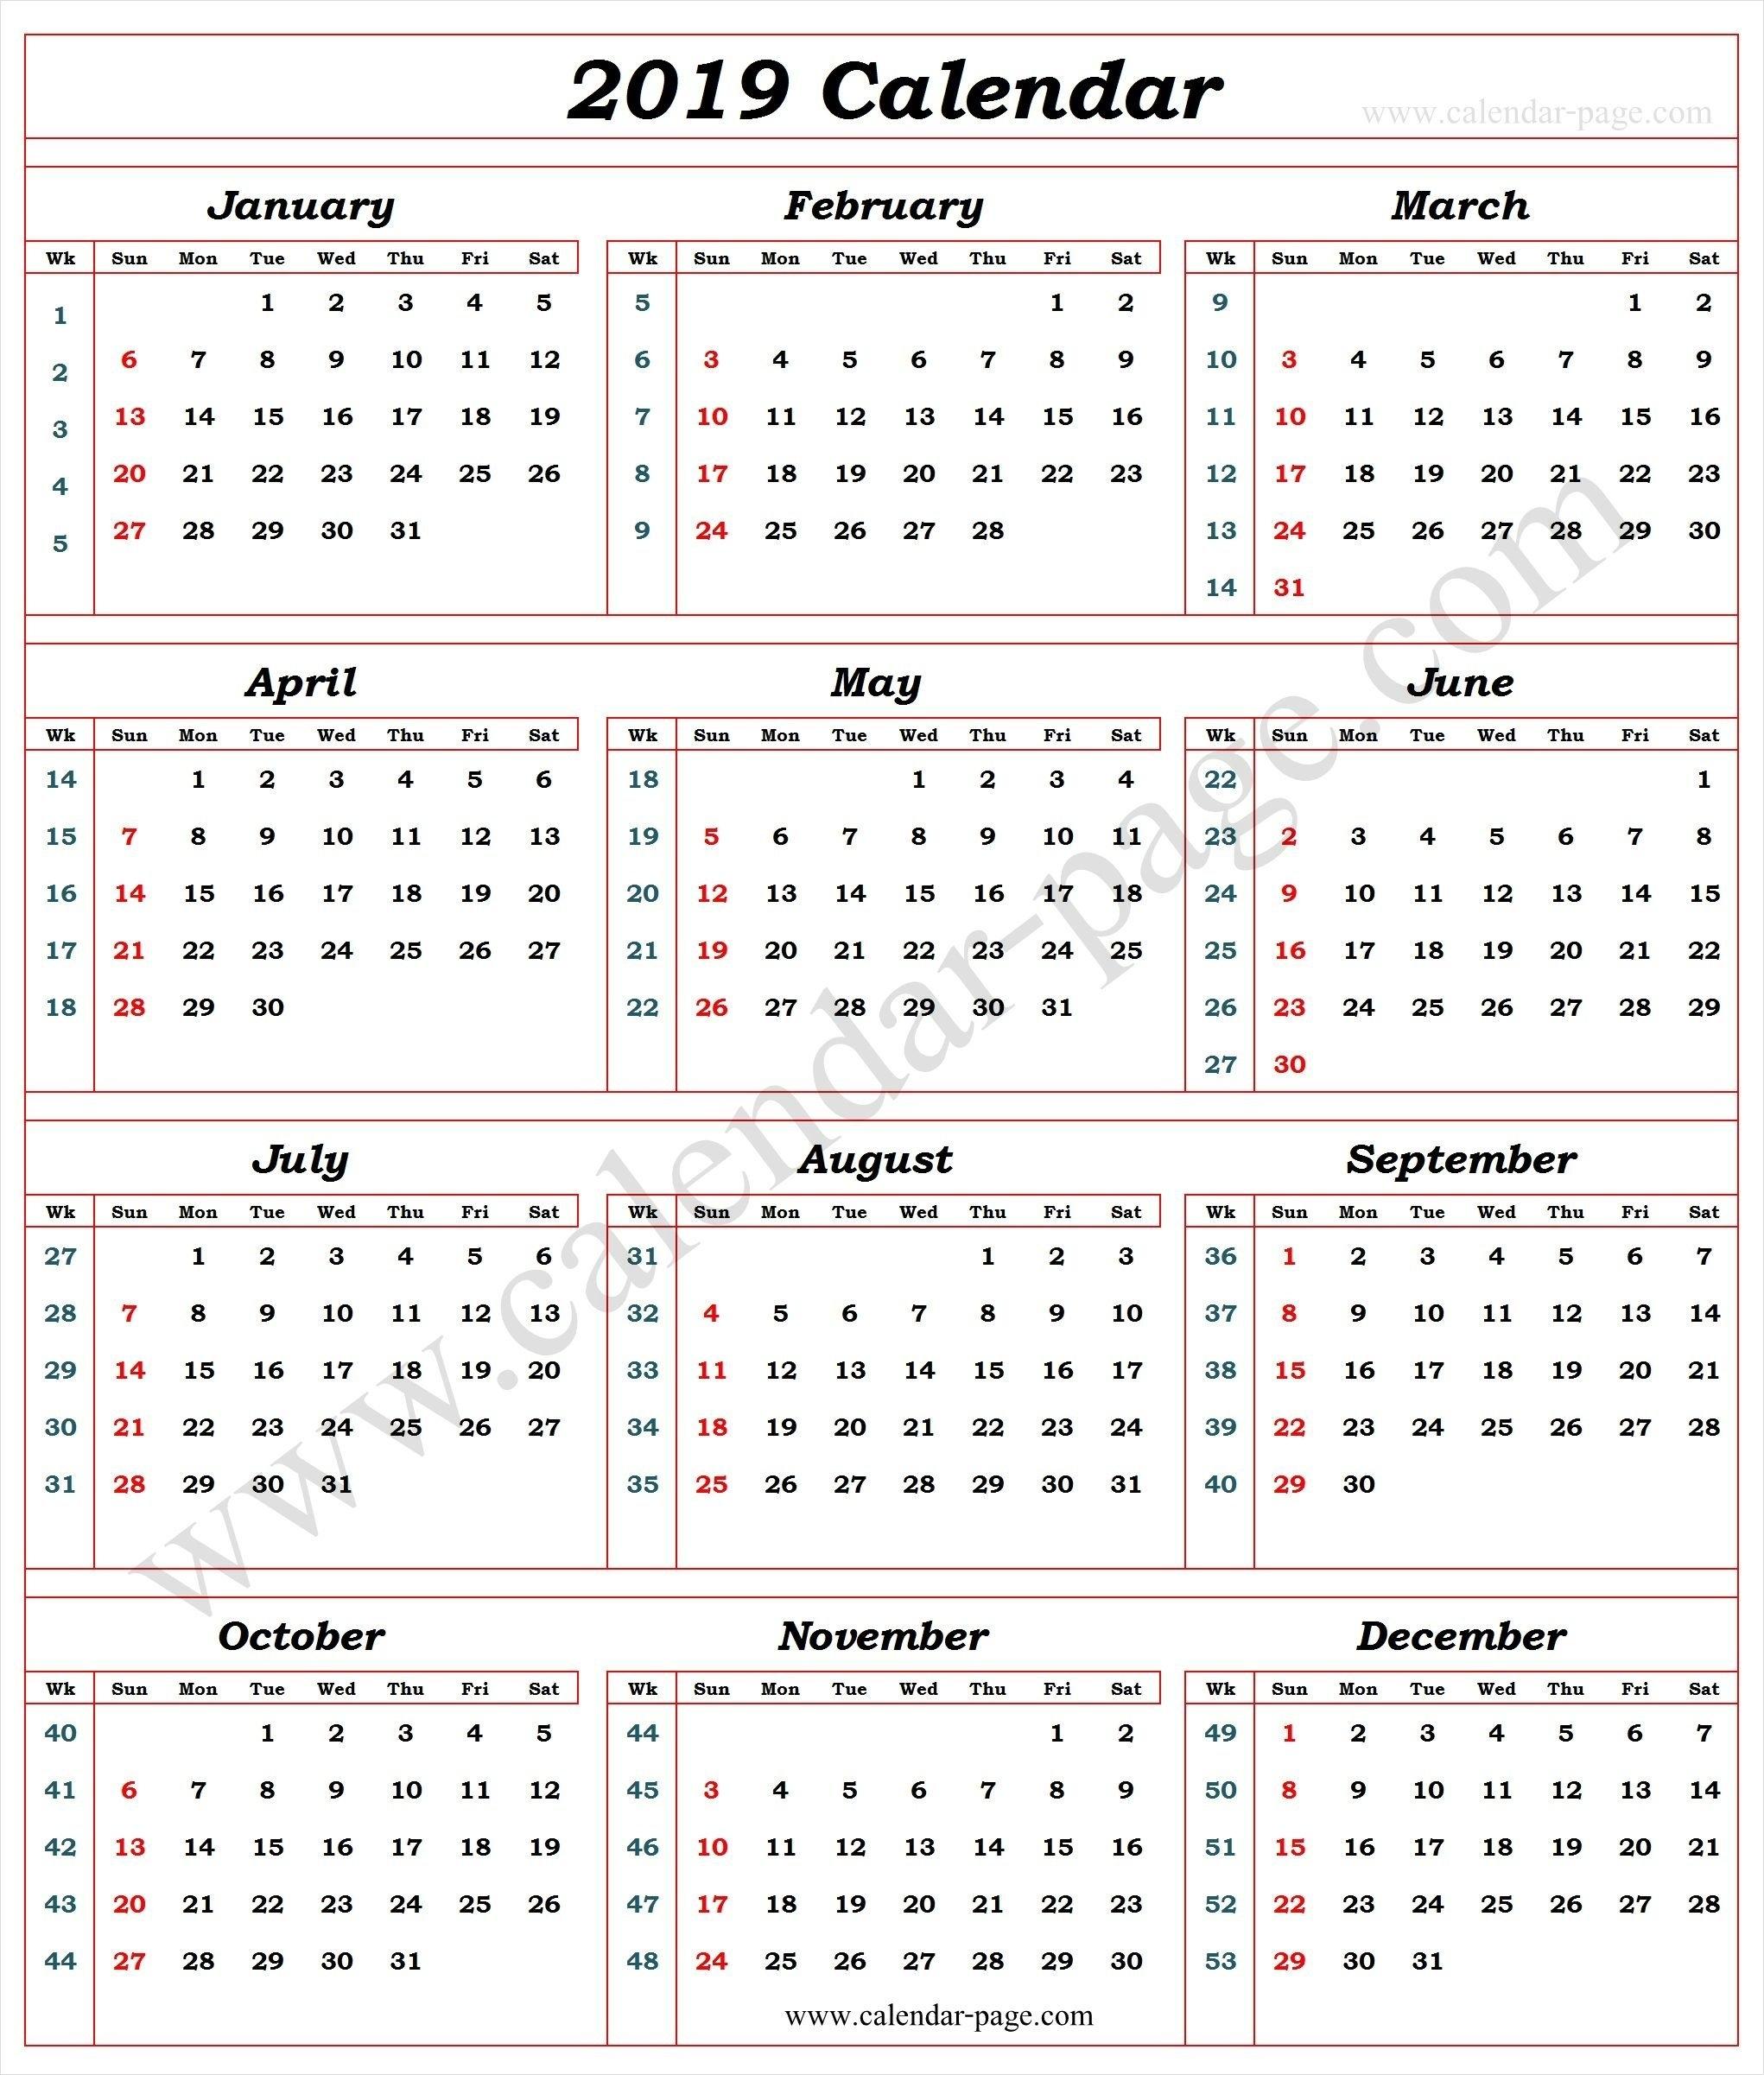 Calendar 2019 With Week Numbers | 2019 Calendar Template | Pinterest Calendar 2019 By Week